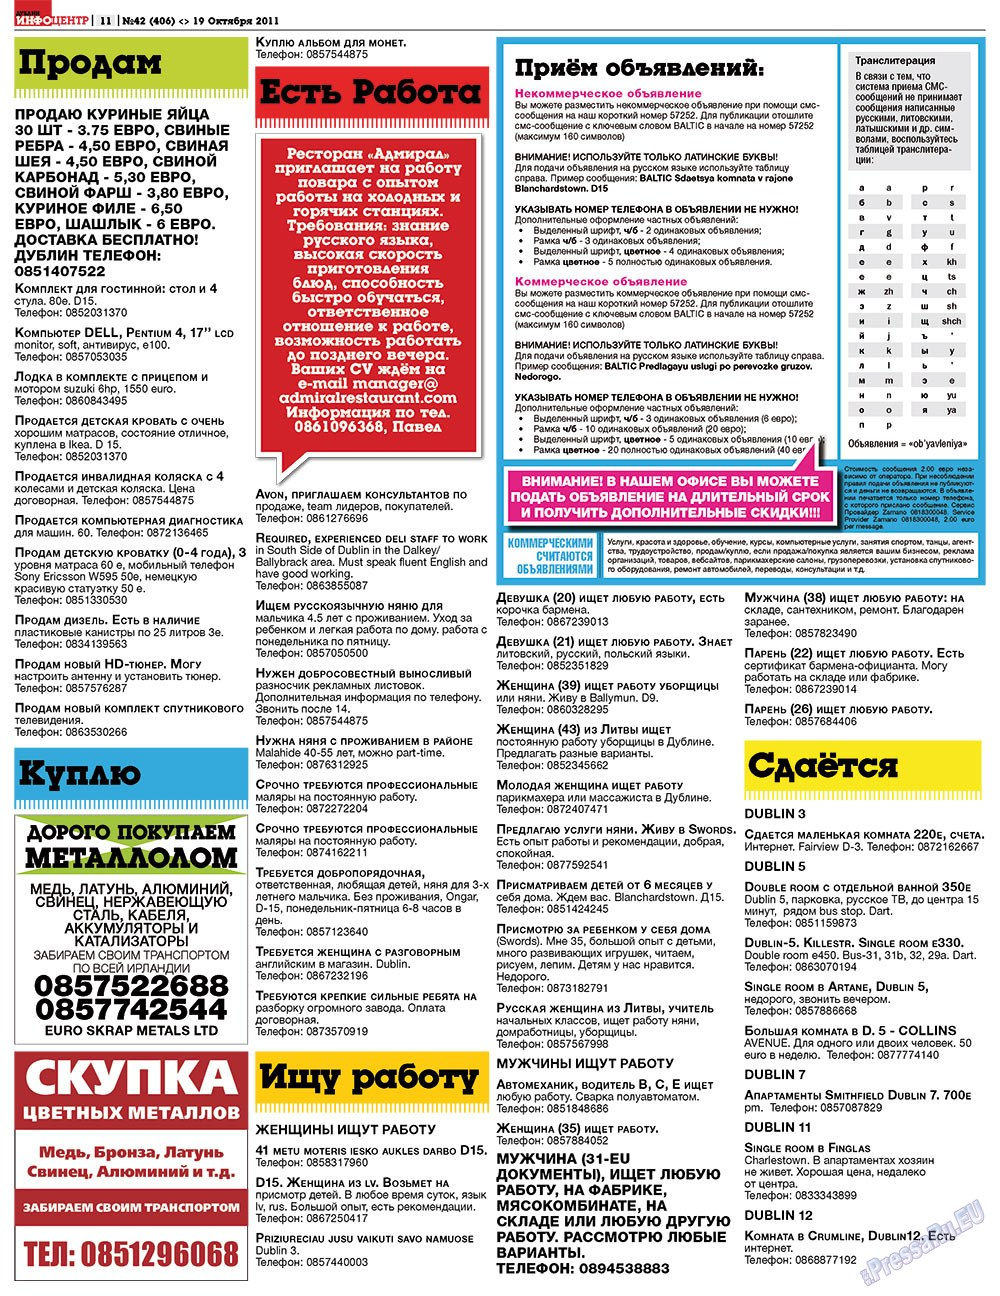 Дублин инфоцентр (газета). 2011 год, номер 42, стр. 11